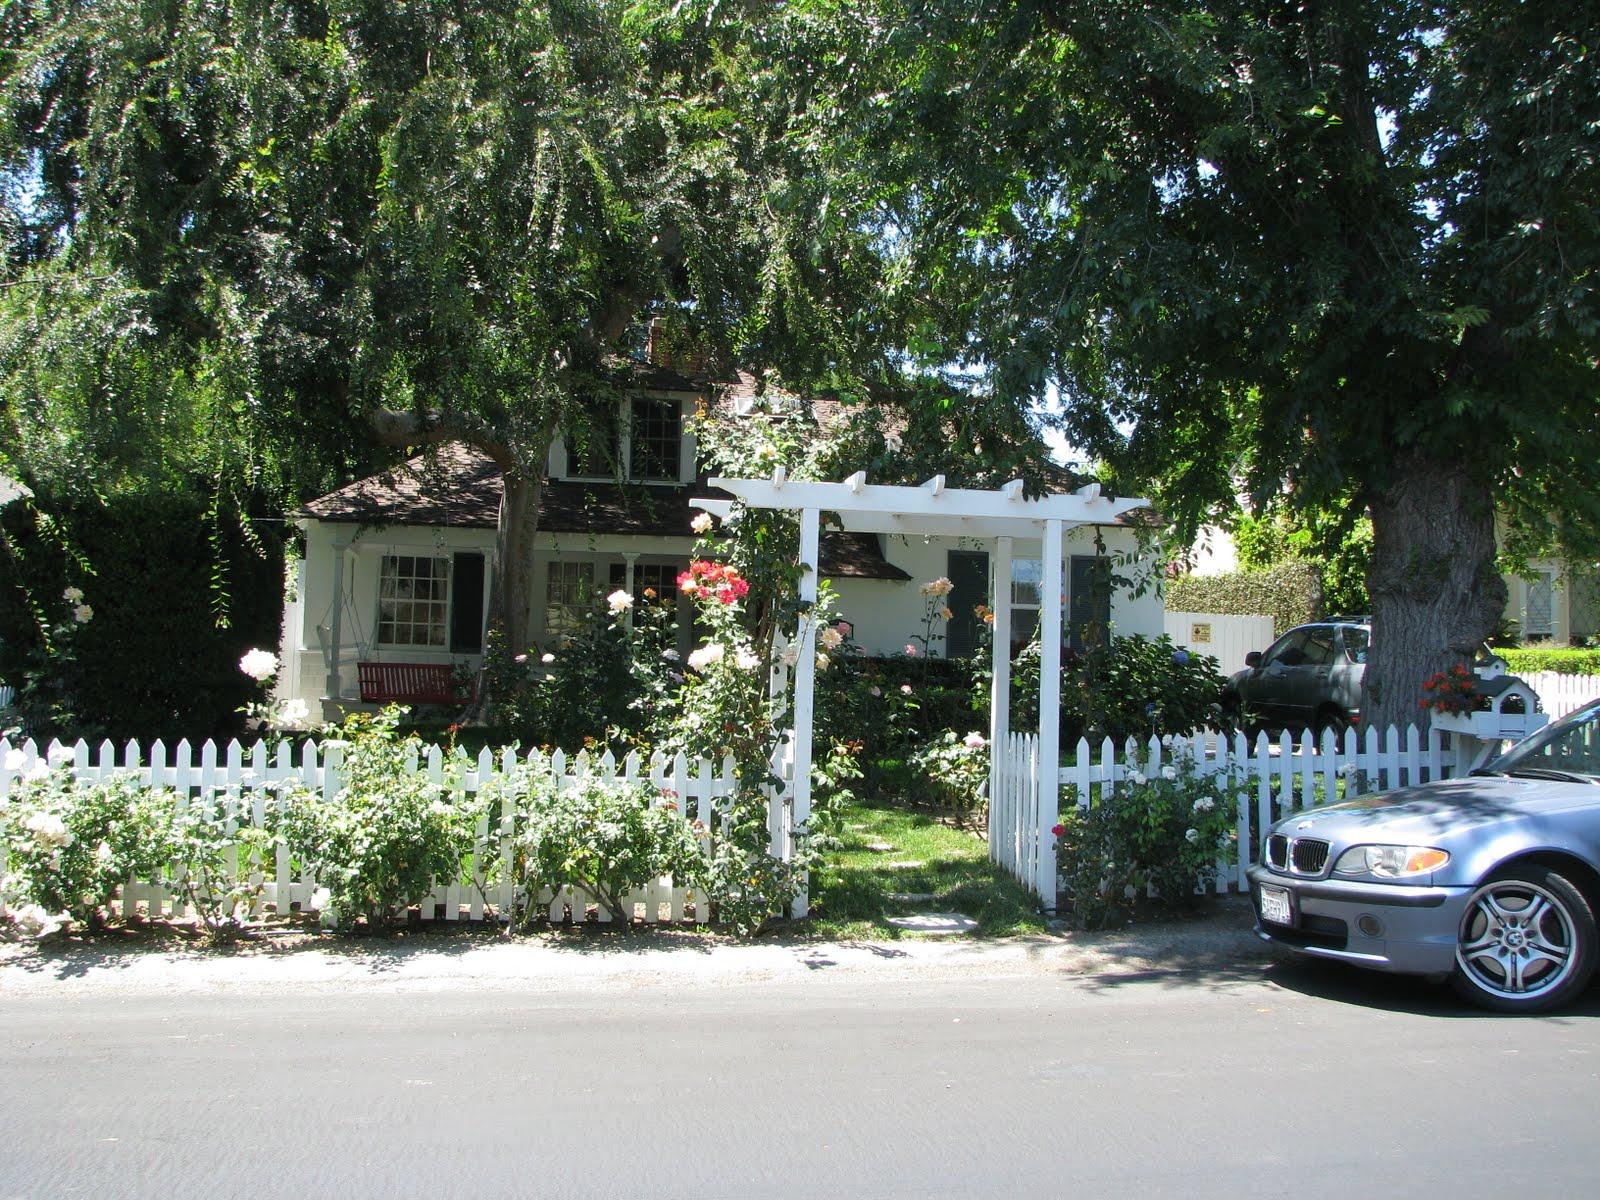 http://1.bp.blogspot.com/_R6Ns11P9G38/TF8hnZQqnCI/AAAAAAAADgA/9qjQPZuDLp8/s1600/Los+Angeles+July+2010+(128).JPG